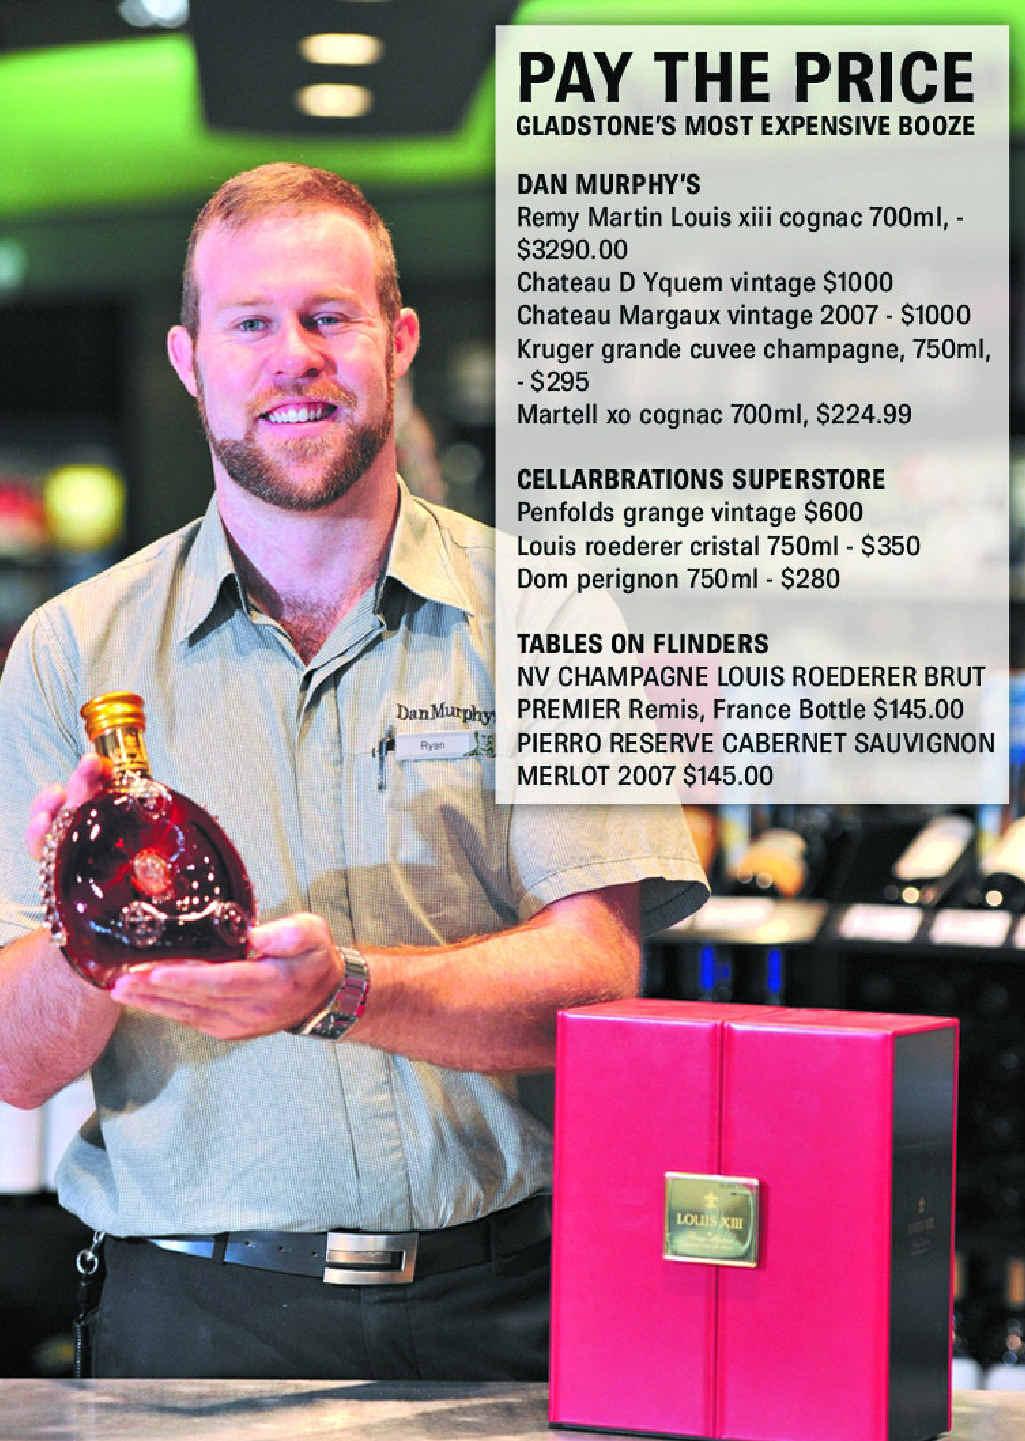 Dan Murphy's Gladstone customer experience manager Ryan Lobegeier is holding a $3000 bottle of Cognac.